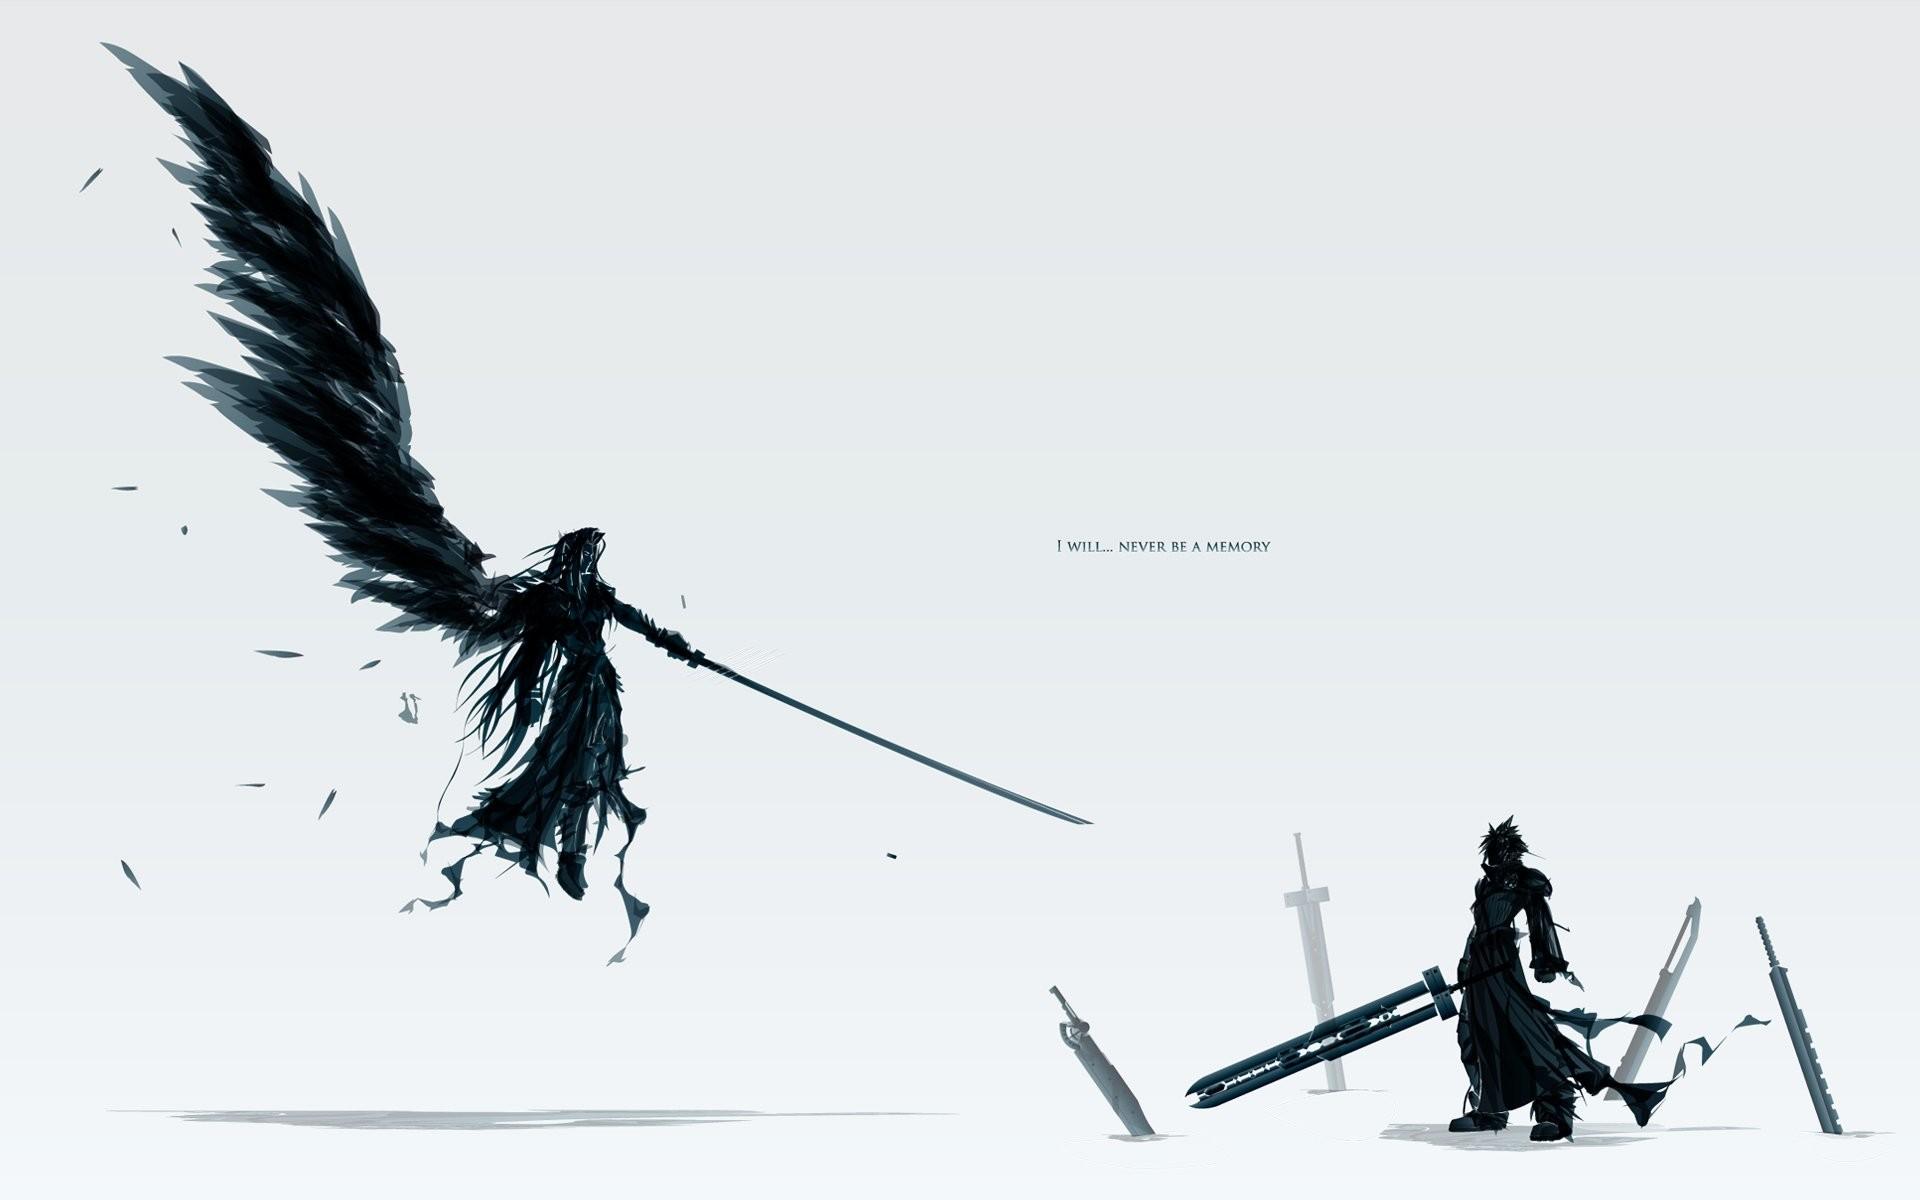 Final Fantasy HD desktop wallpaper High Definition